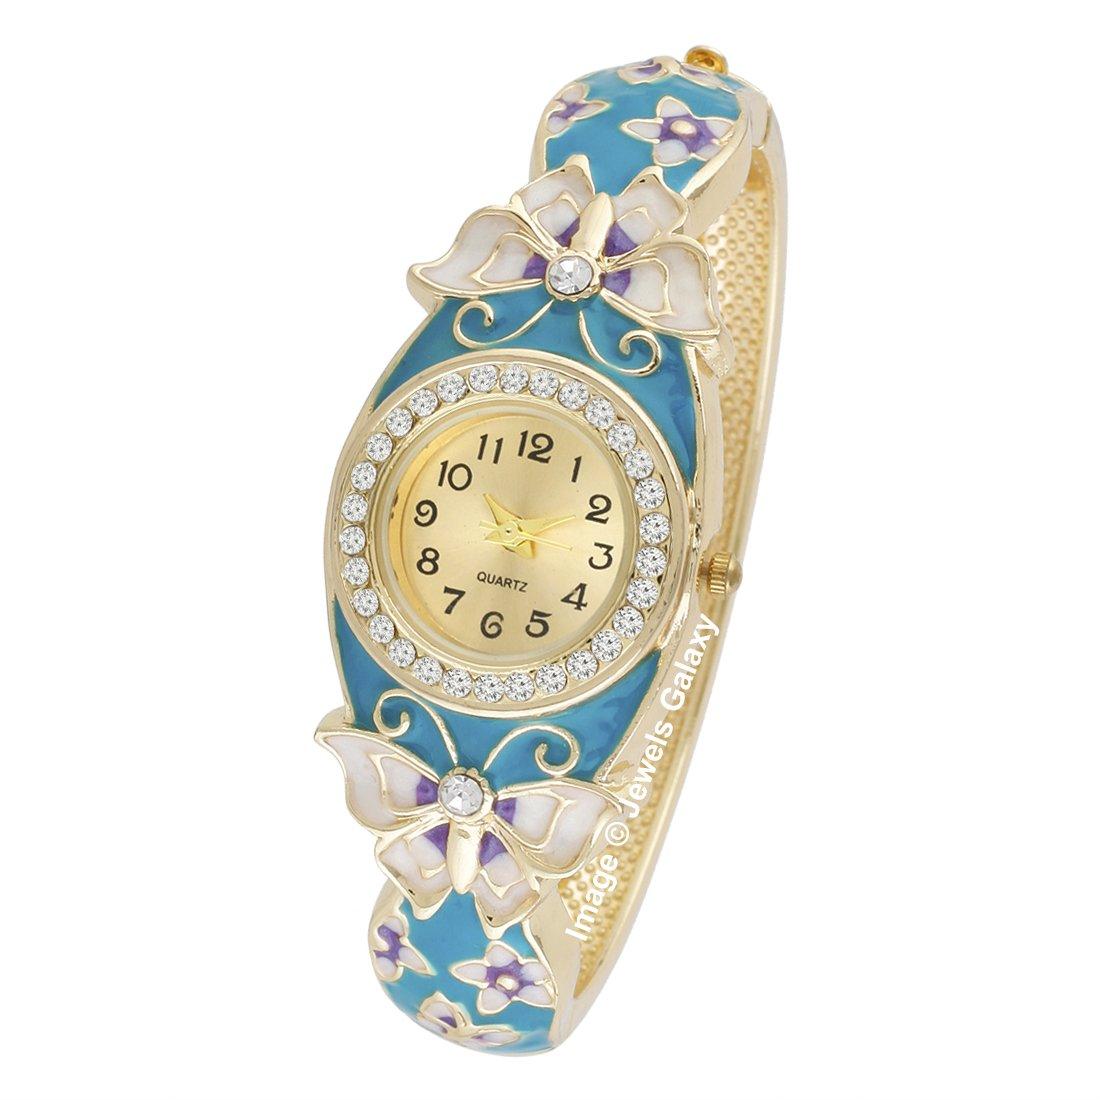 sklep internetowy buty jesienne niska cena Jewels Galaxy Limited Edition Luxuria AD Butterfly Designer ...